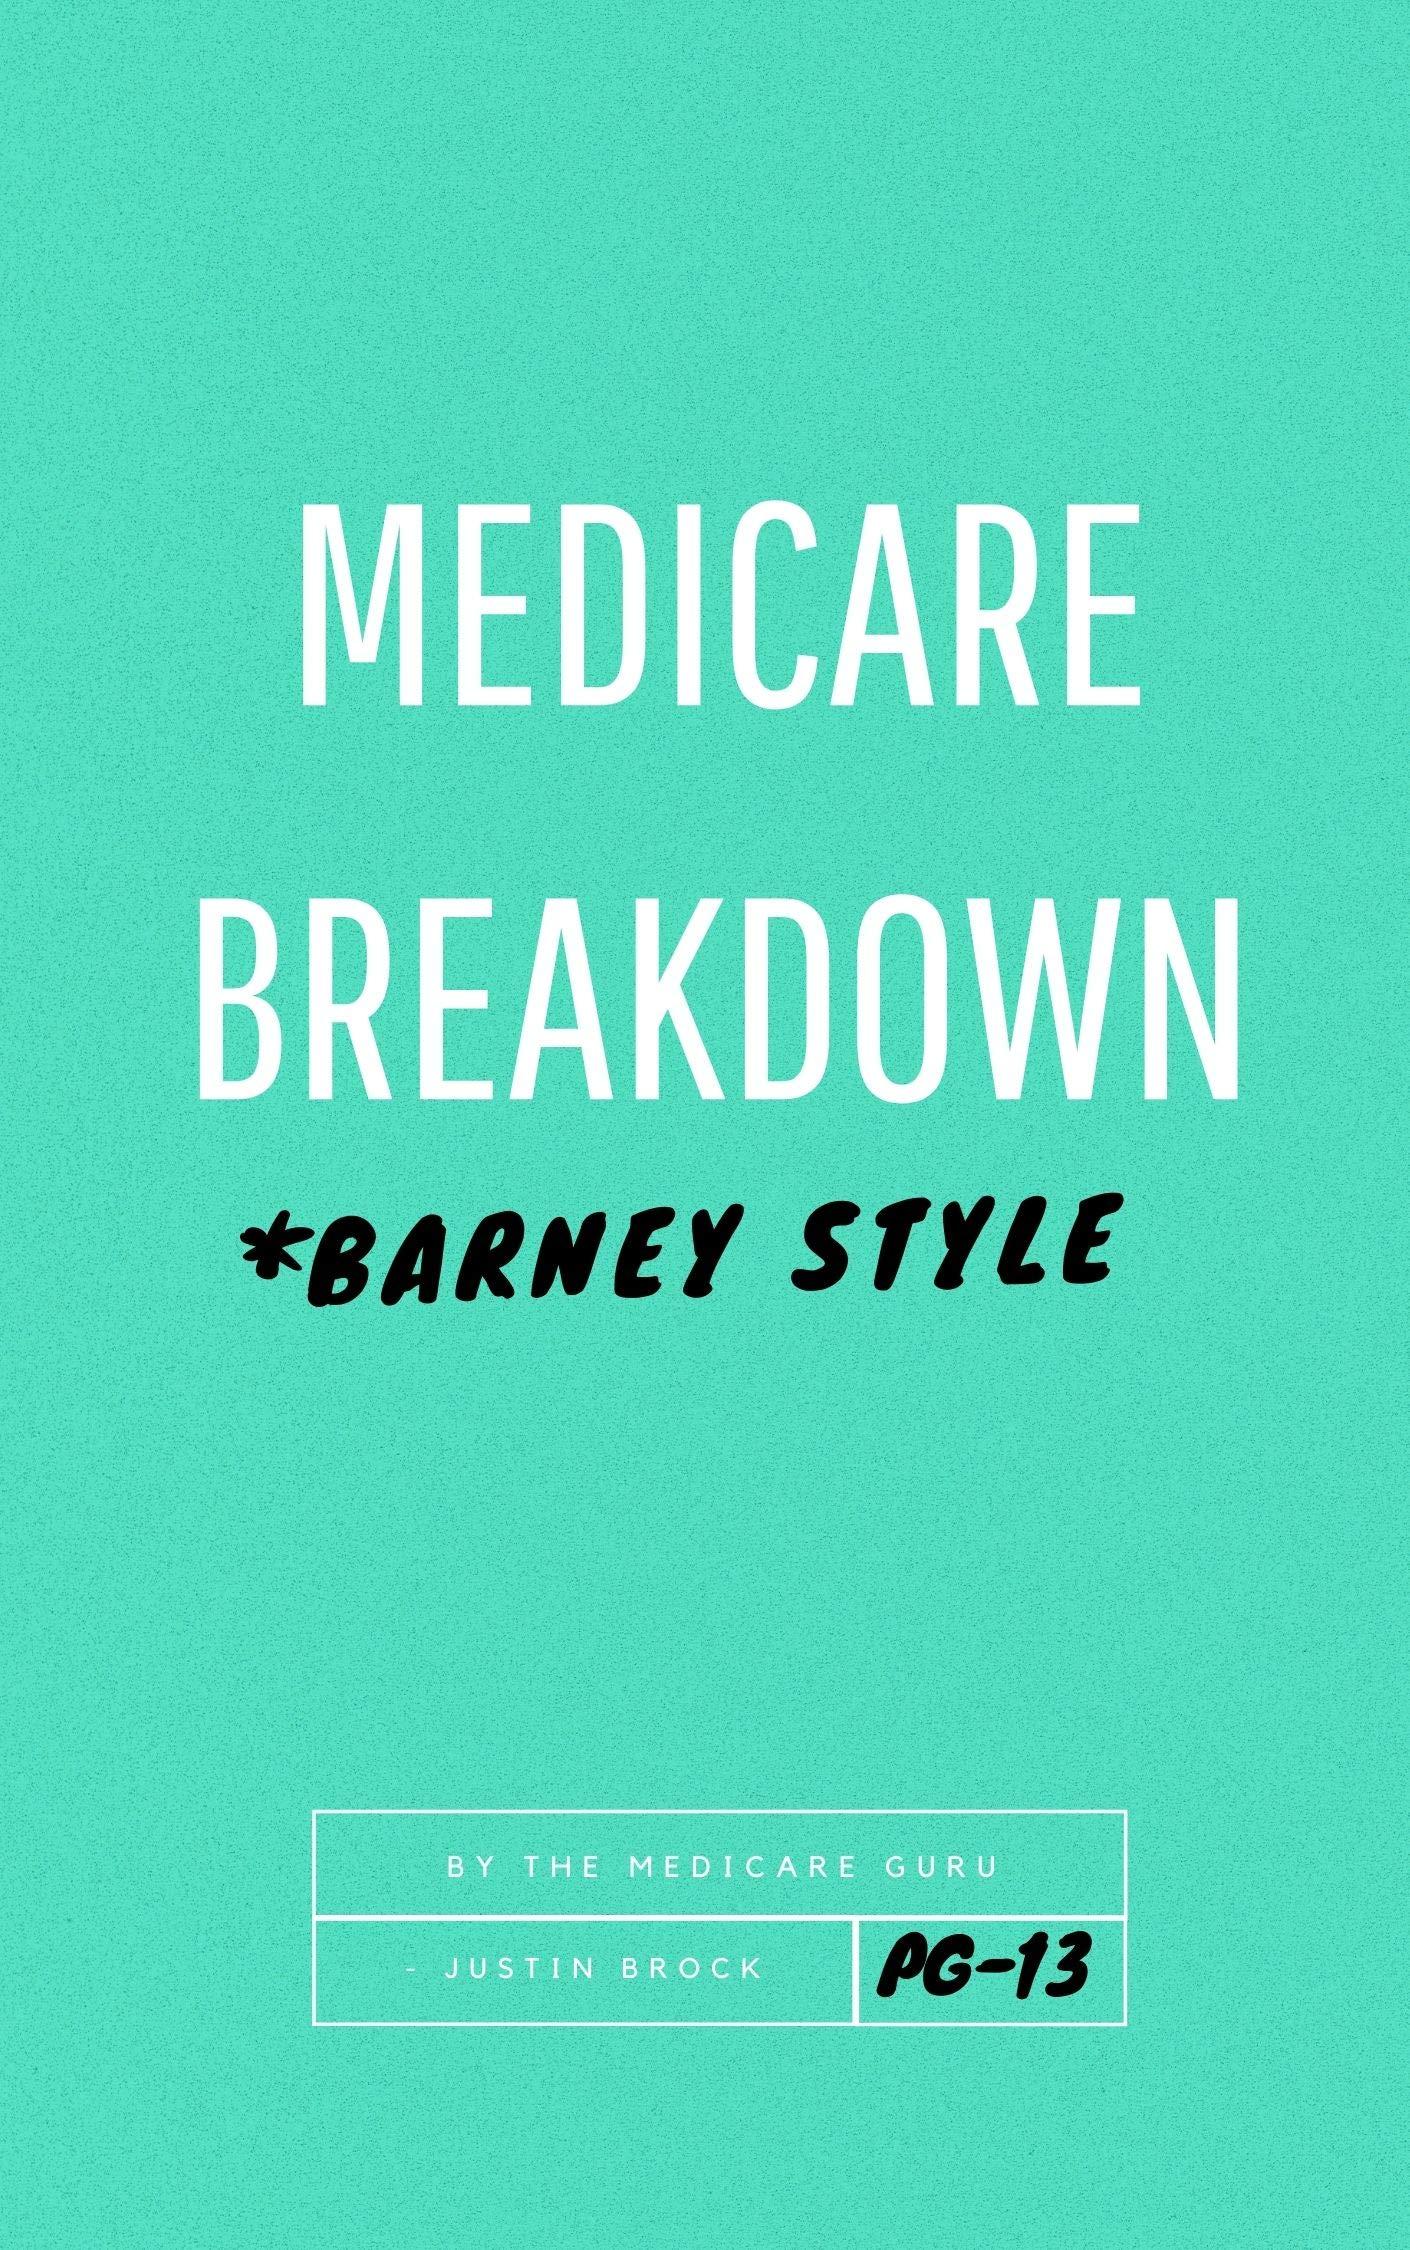 Medicare Broken Down Barney Style